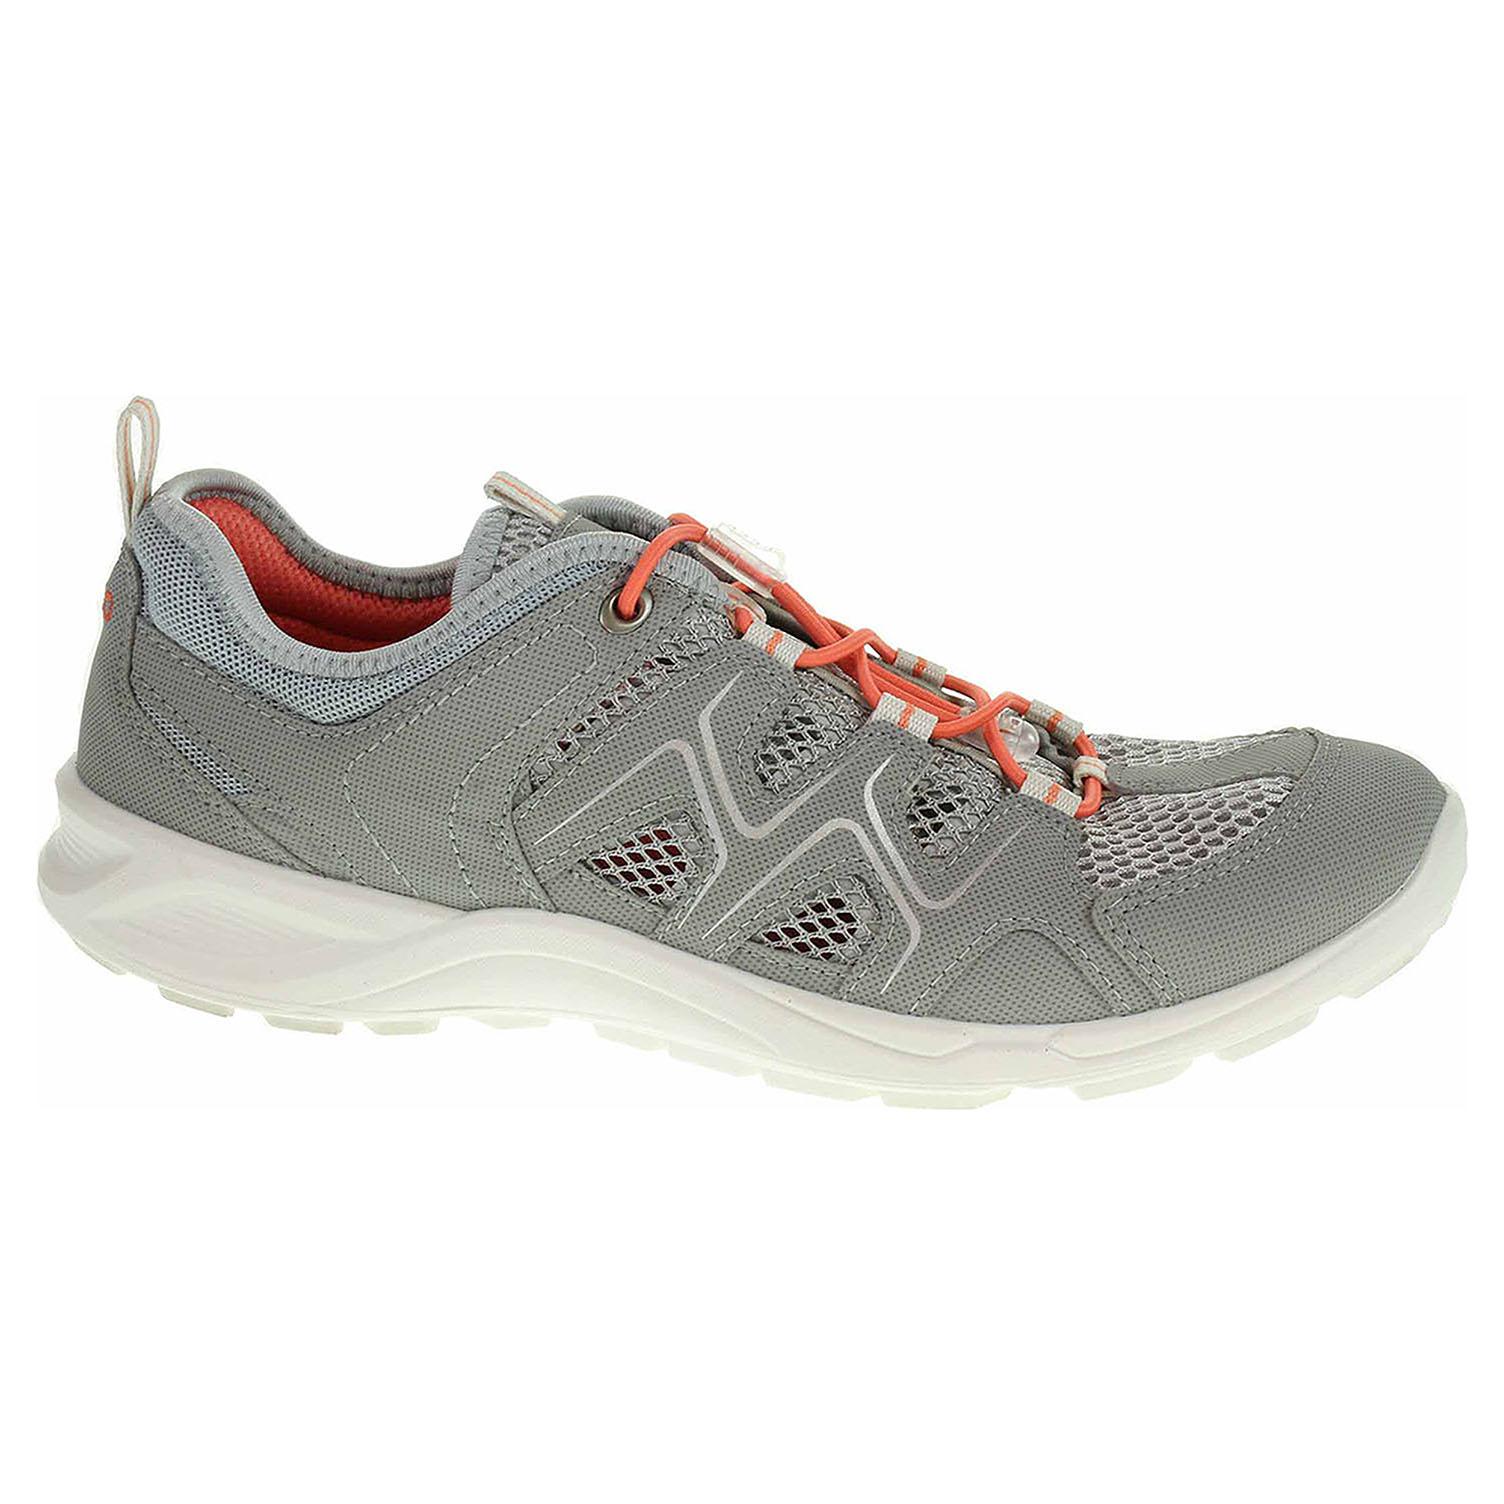 Dámská obuv Ecco Terracruise LT W 82577359105 silver grey/silver metallic 82577359105 39